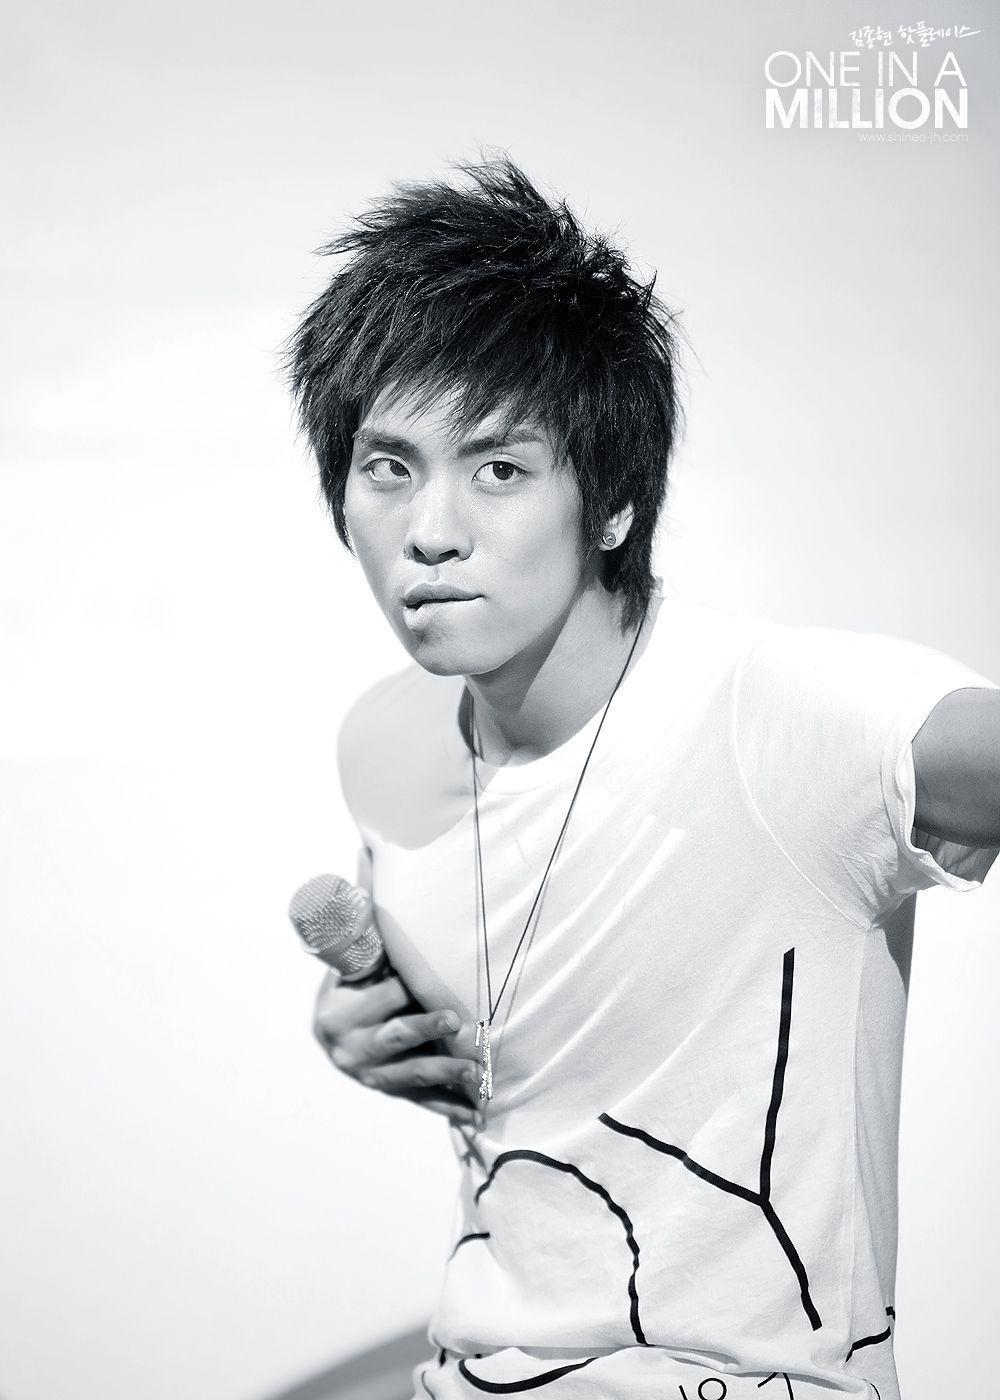 SHINee Jonghyun Ring Ding Dong Wallpapers - Top Free SHINee